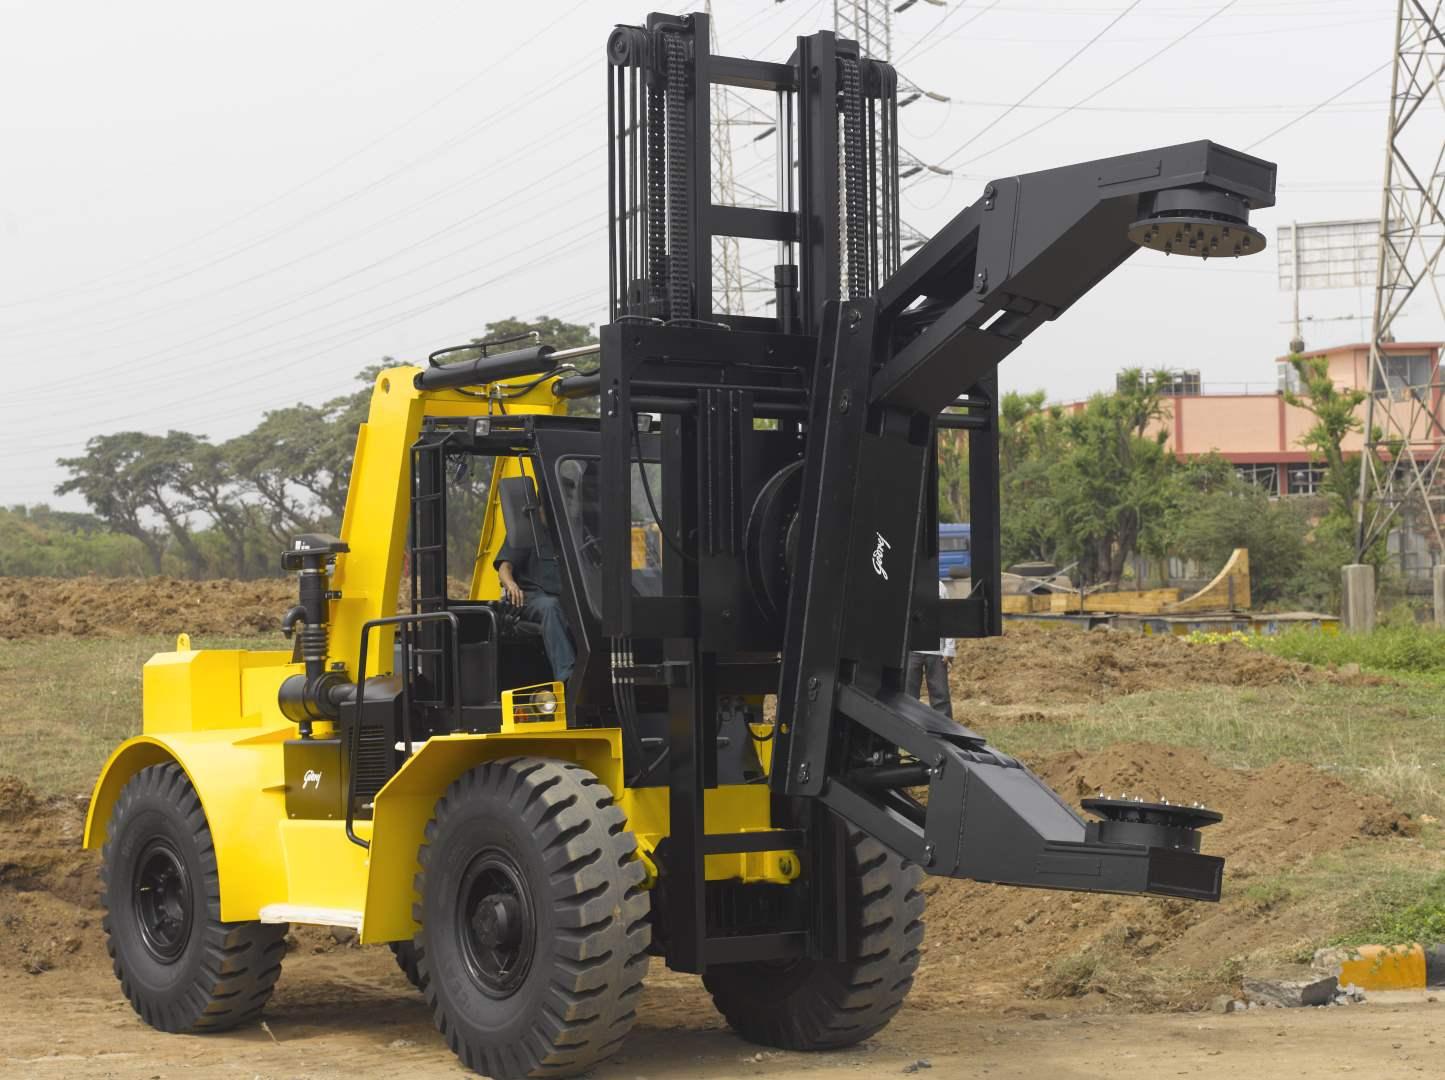 0-5-to-3-5-tonne-Godrej-Tyre-Handler